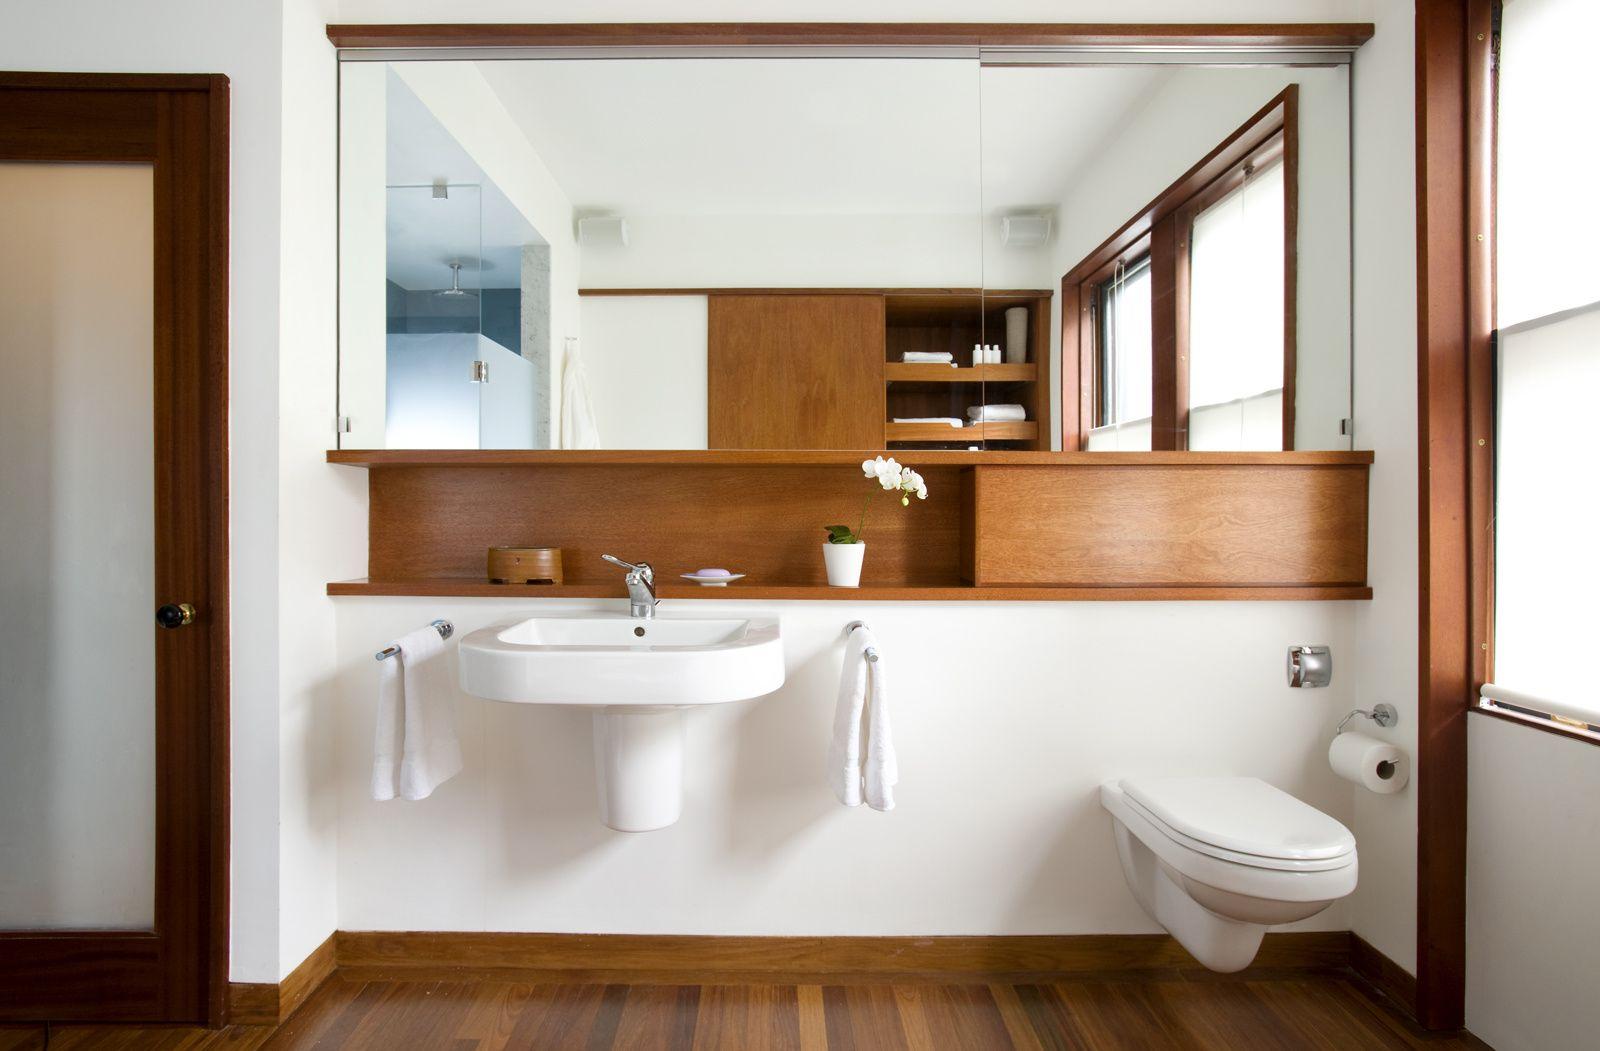 Loo u improved medicine cabinet mirror bathroom storage and